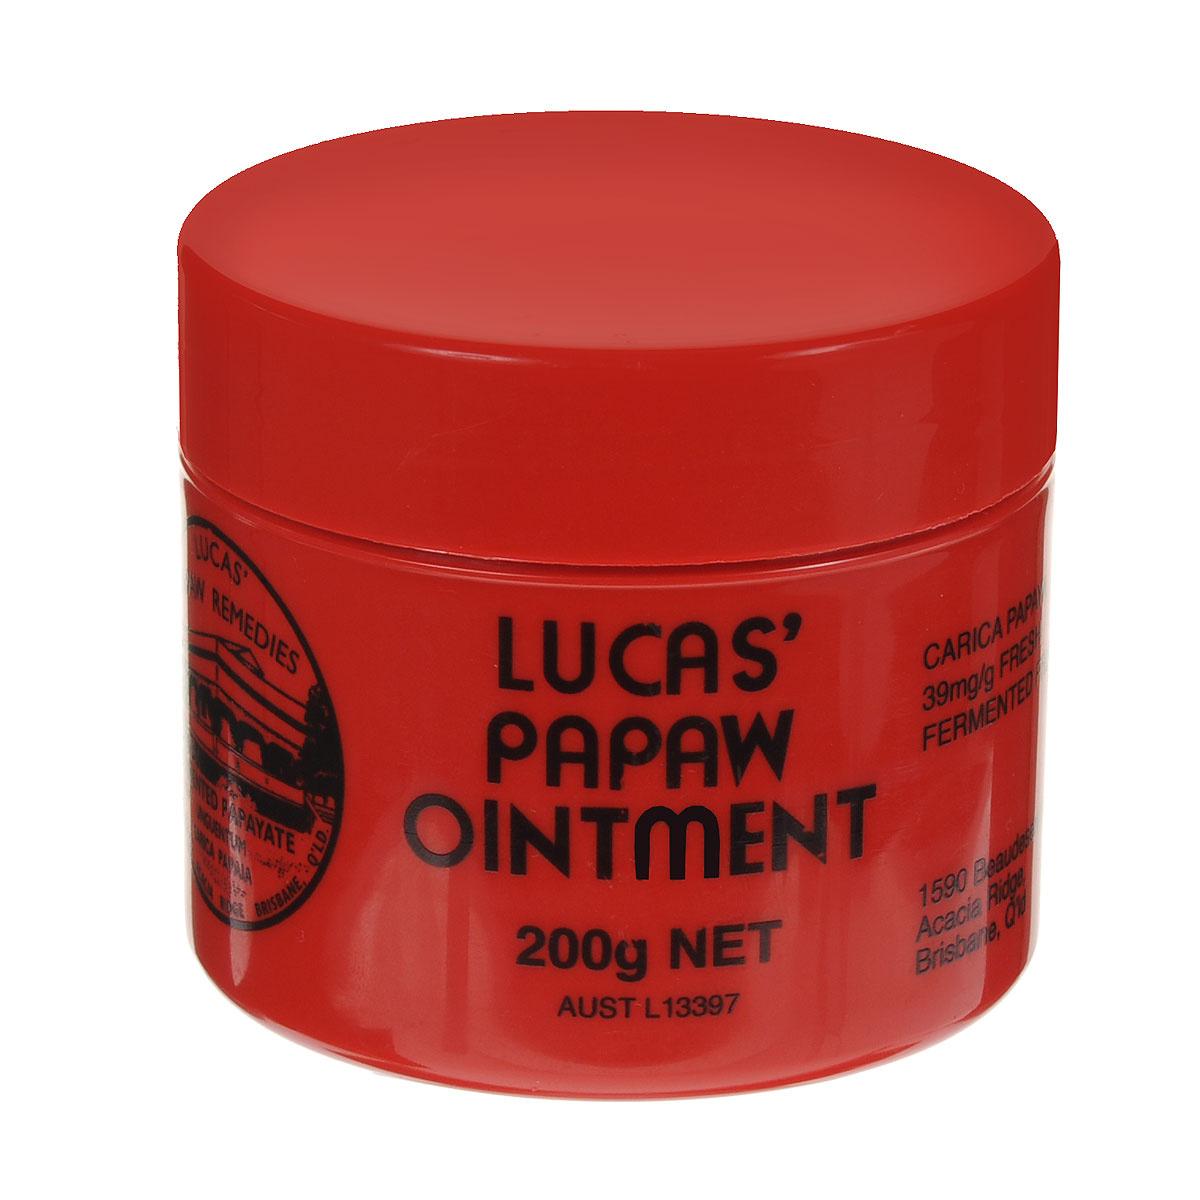 "Lucas Papaw Бальзам для губ ""Ointment"", 200 г #1"